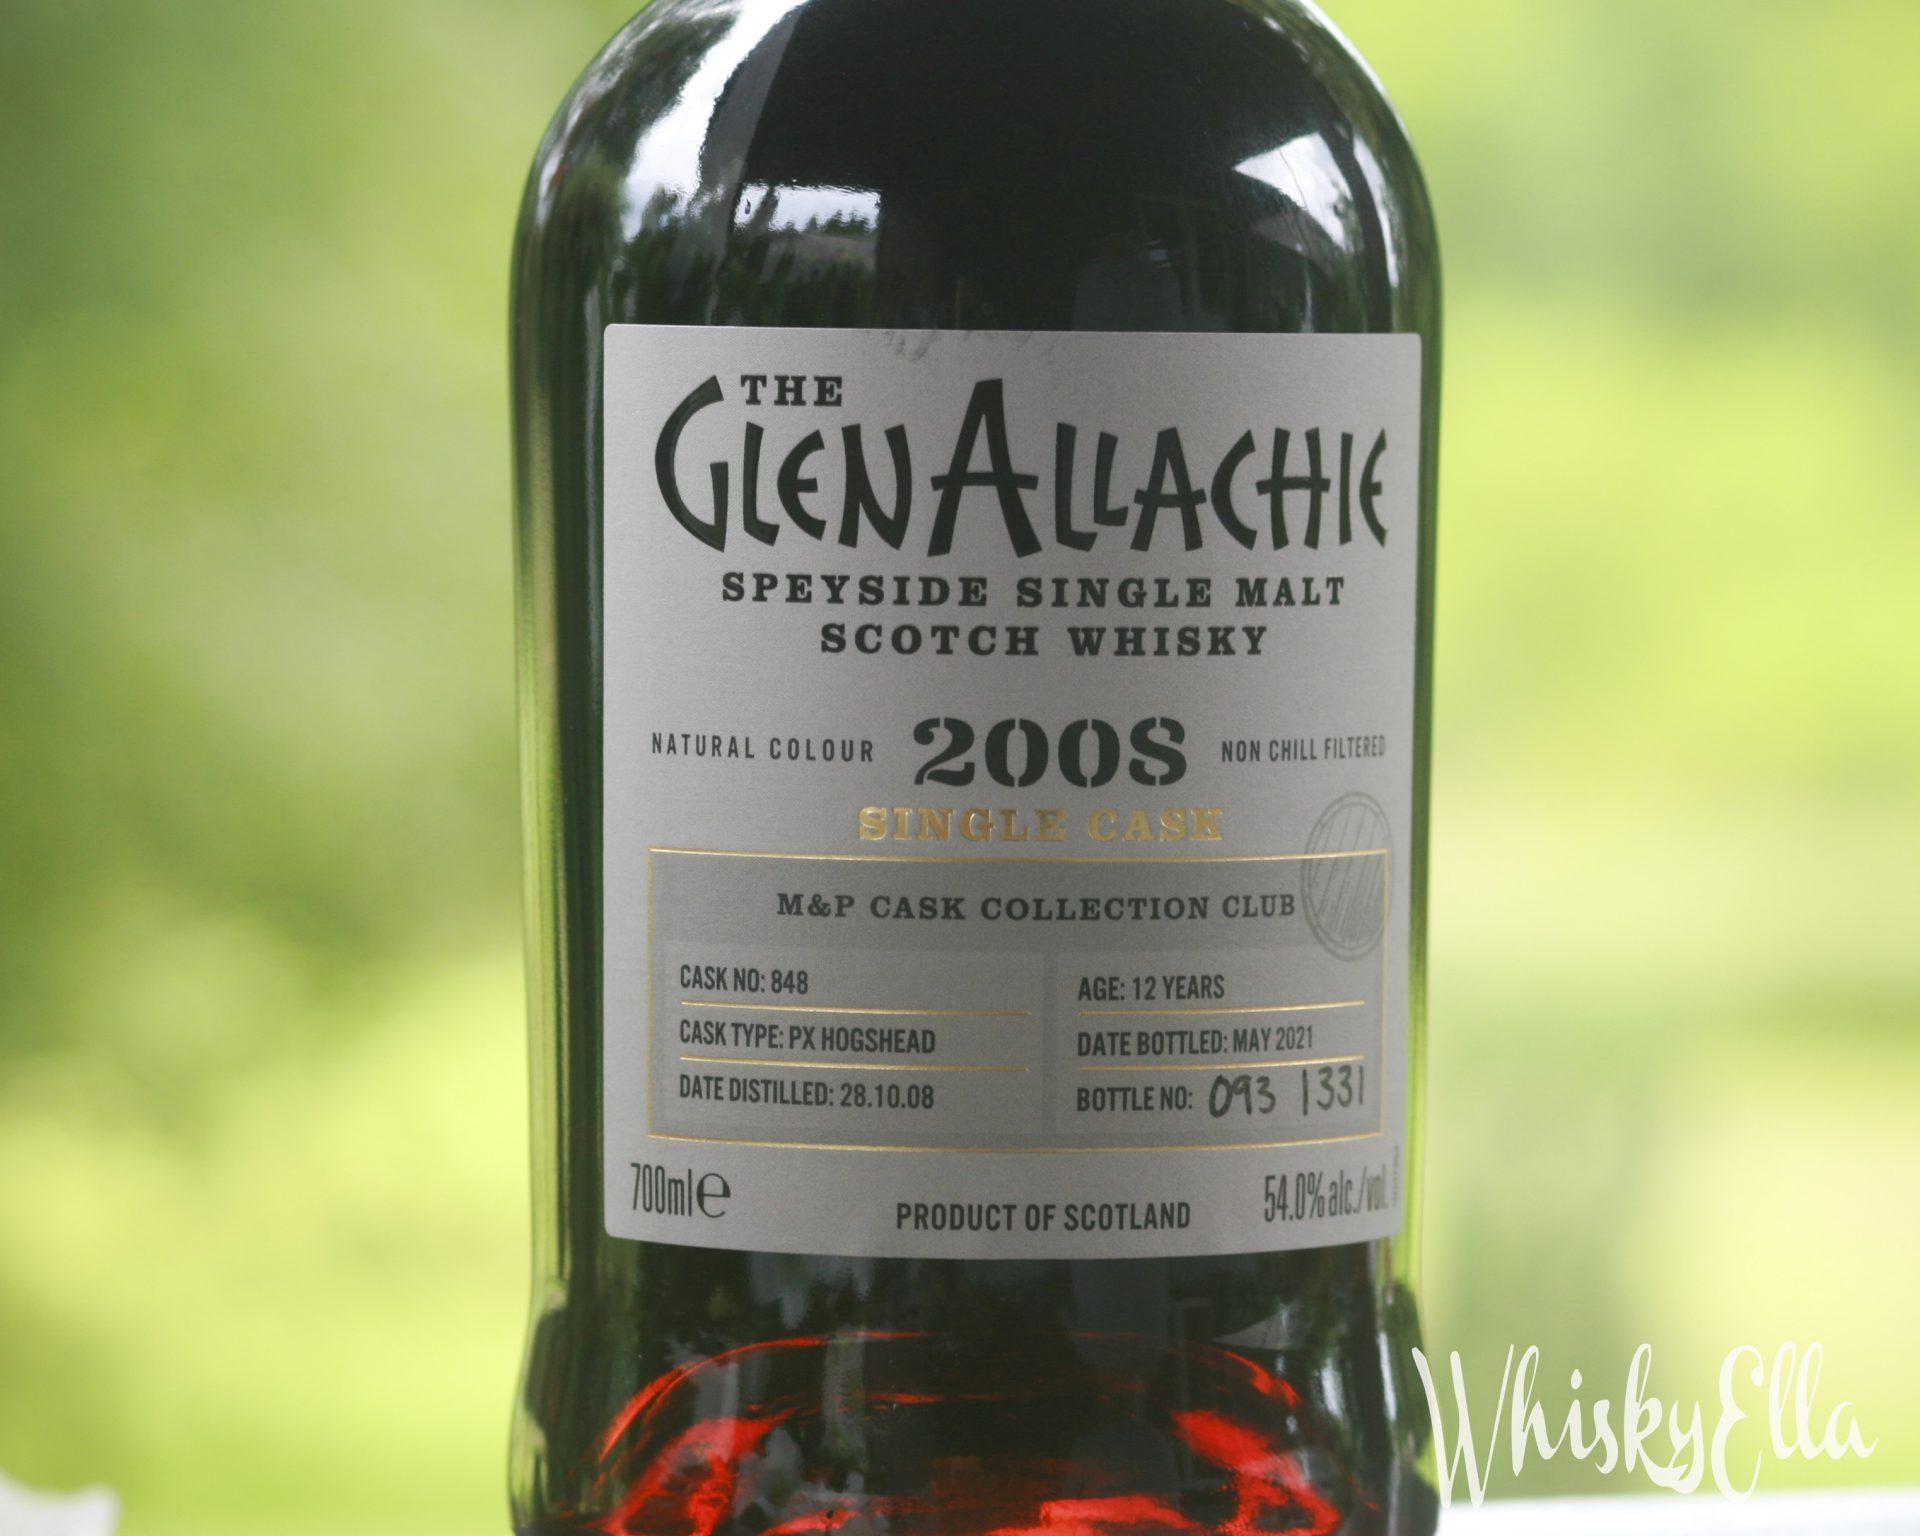 Nasza recenzja Glenallachie 2008 single cask 12 yo Pedro Ximenez M&P #112